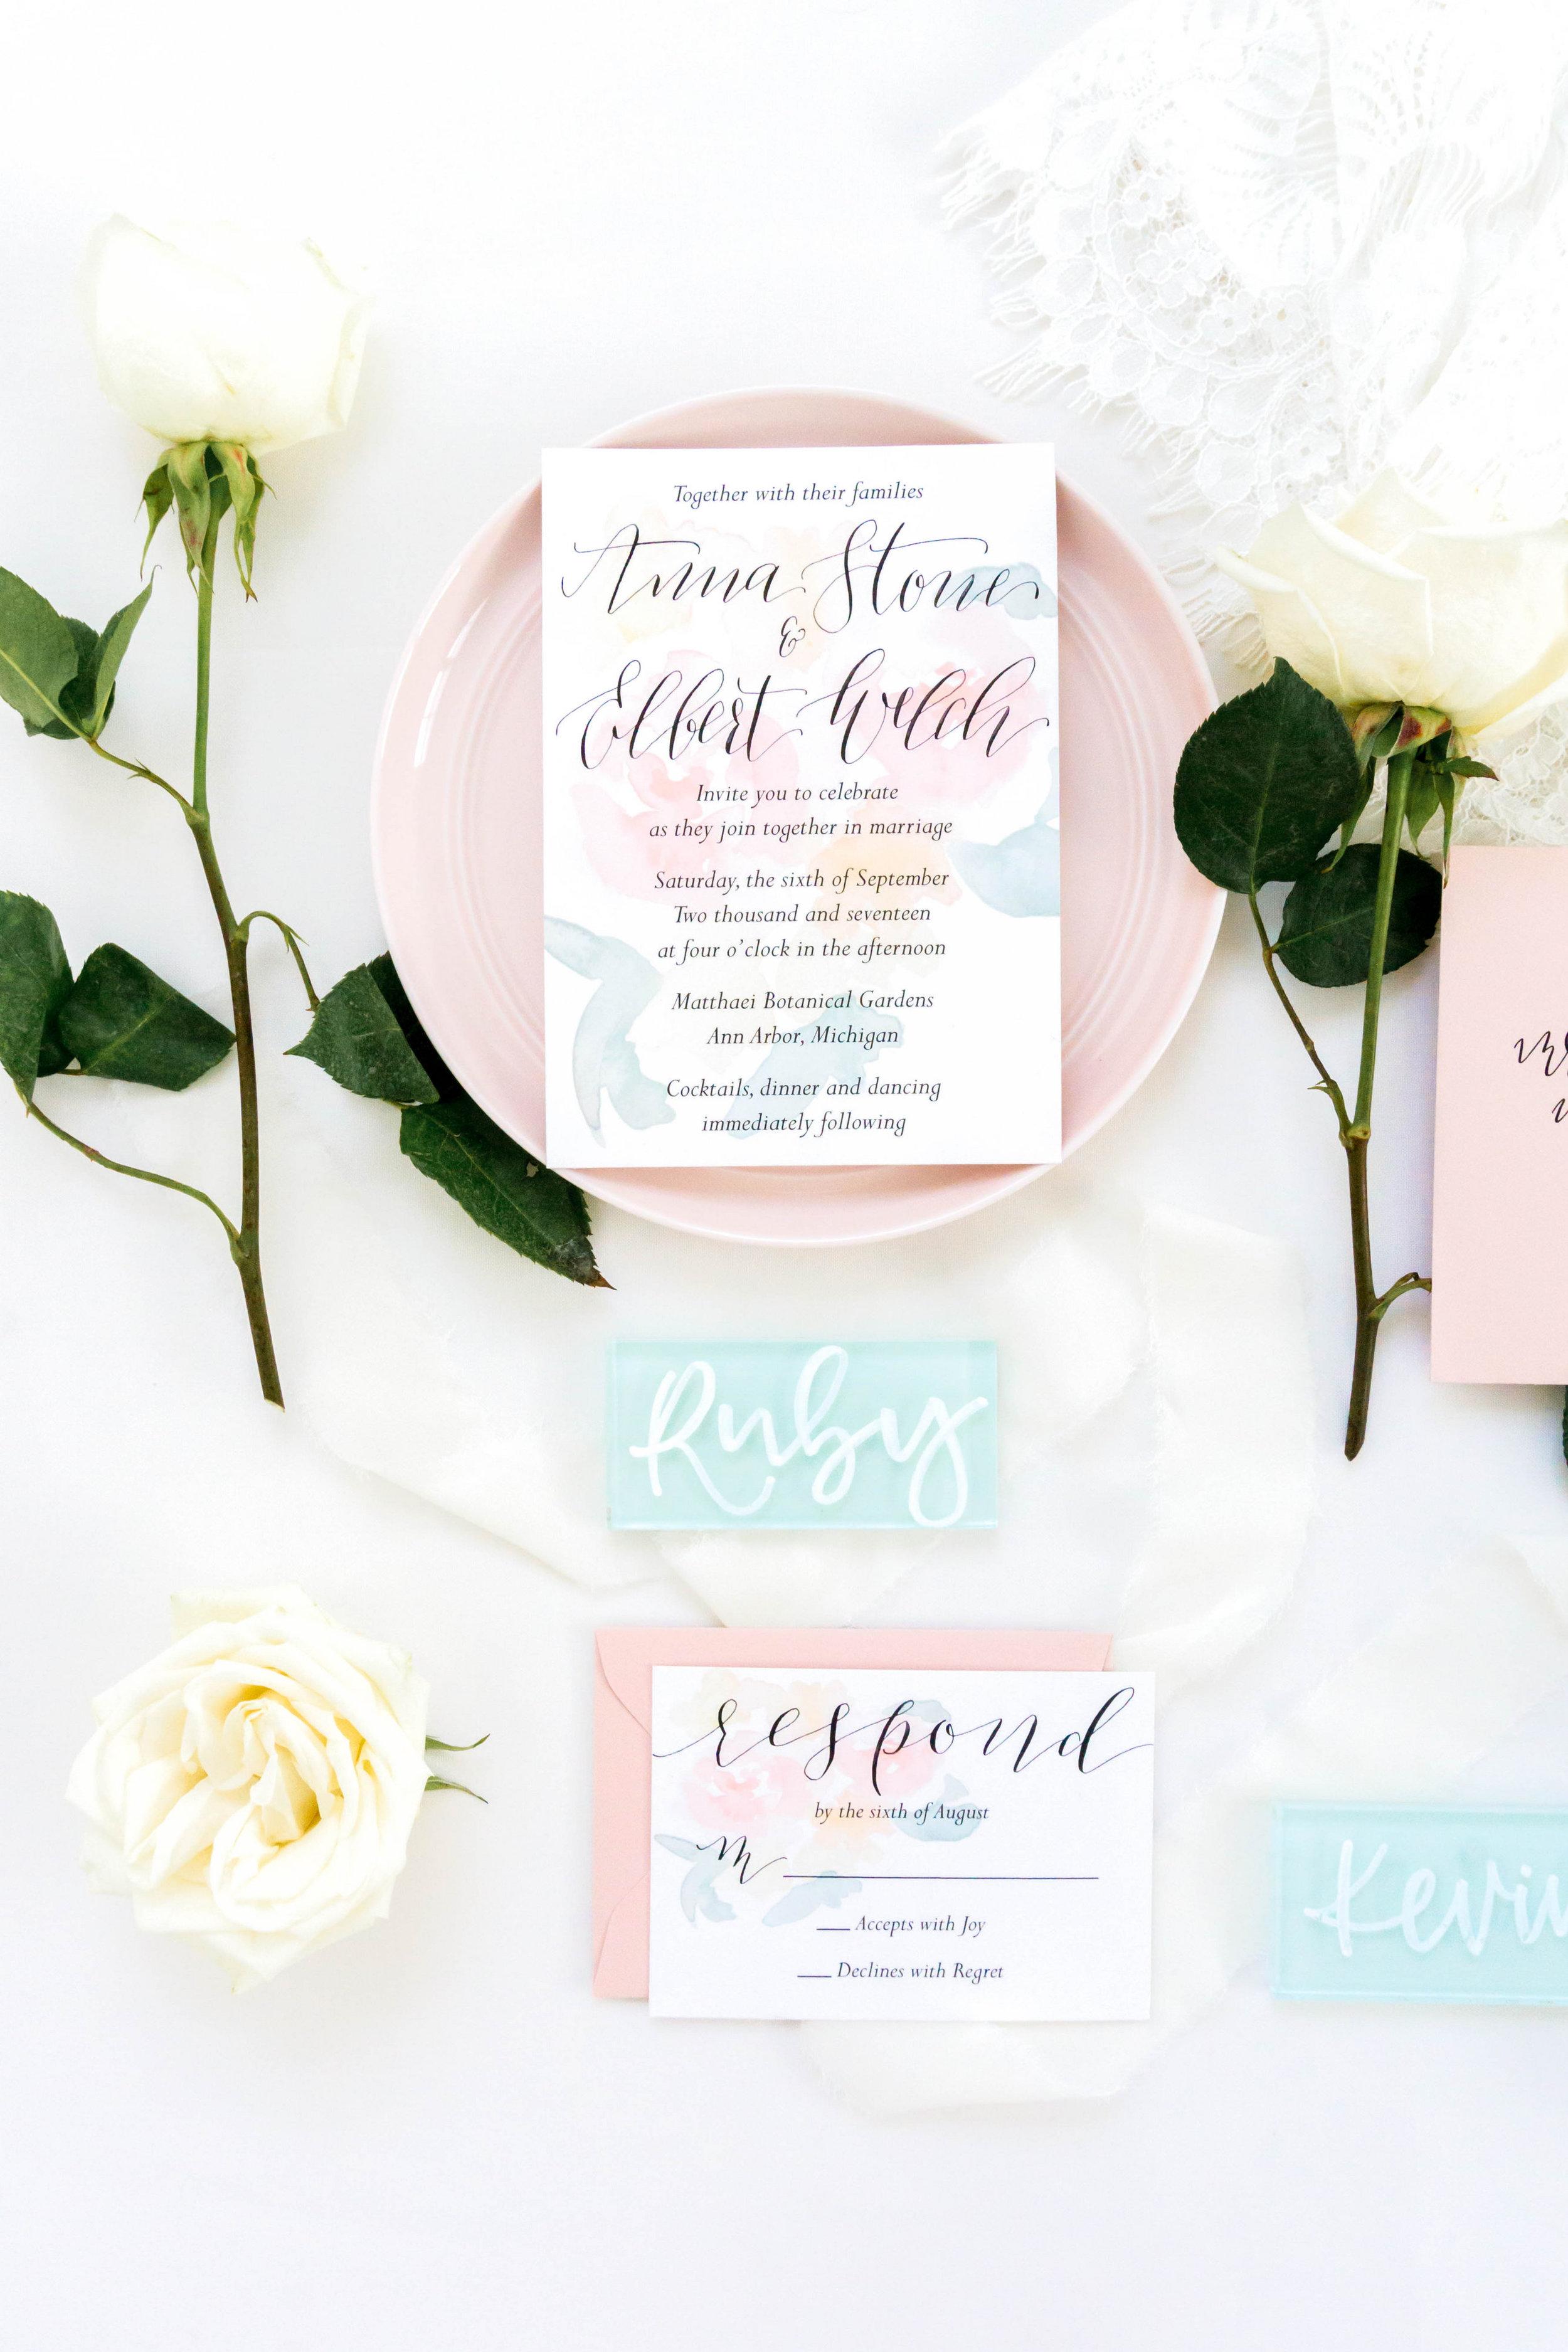 love-fern-design-studio-custom-wedding-invitations-for-the-modern-couple-modern-calligraphy-in-seattle-washington-custom-wedding-stationery-blush-sage-floral-watercolor